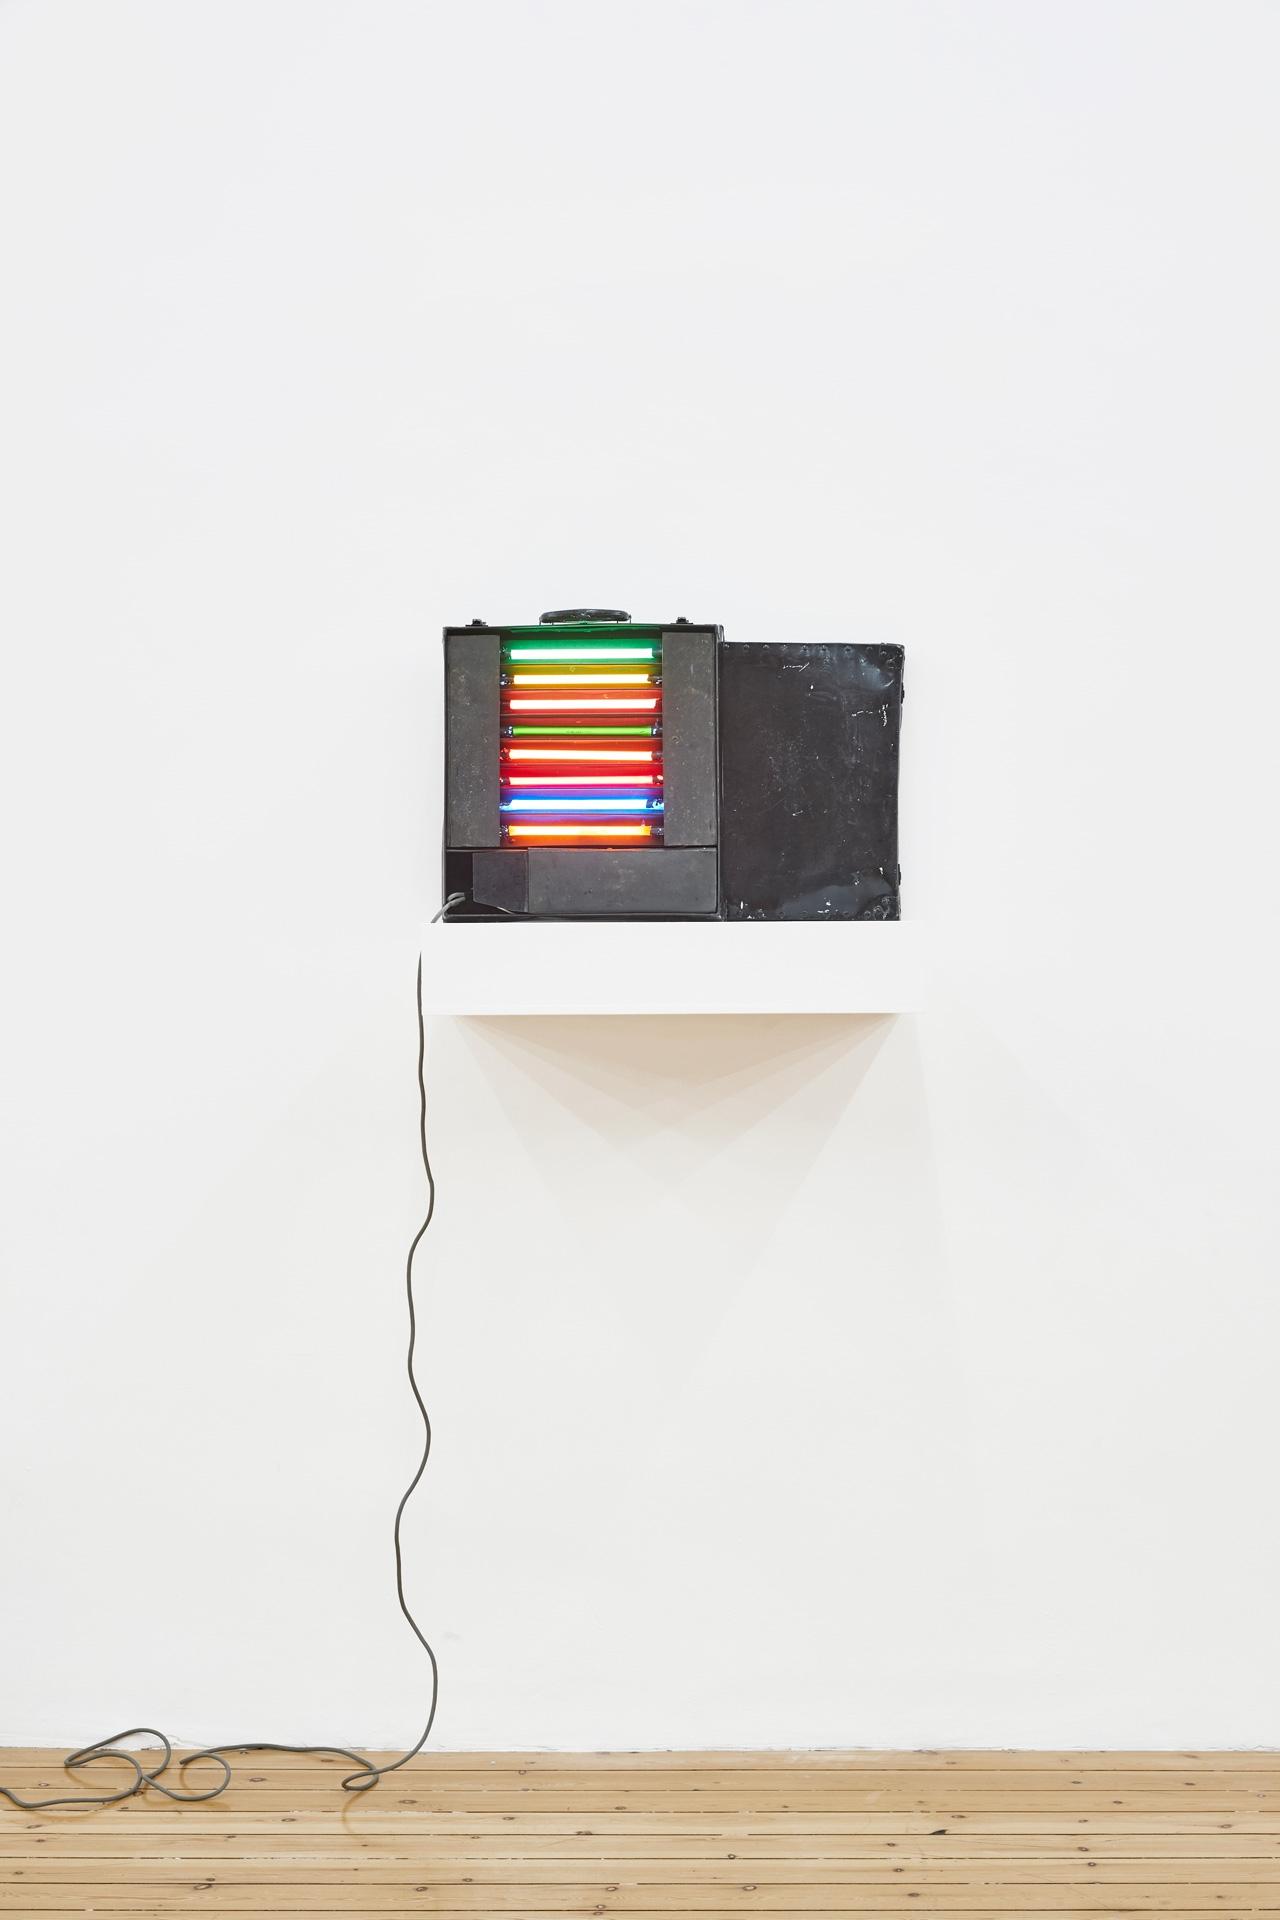 Found Suitcase, 2020, neon, metal, plastic, 12.7 x 40.64 x 43.18 cm